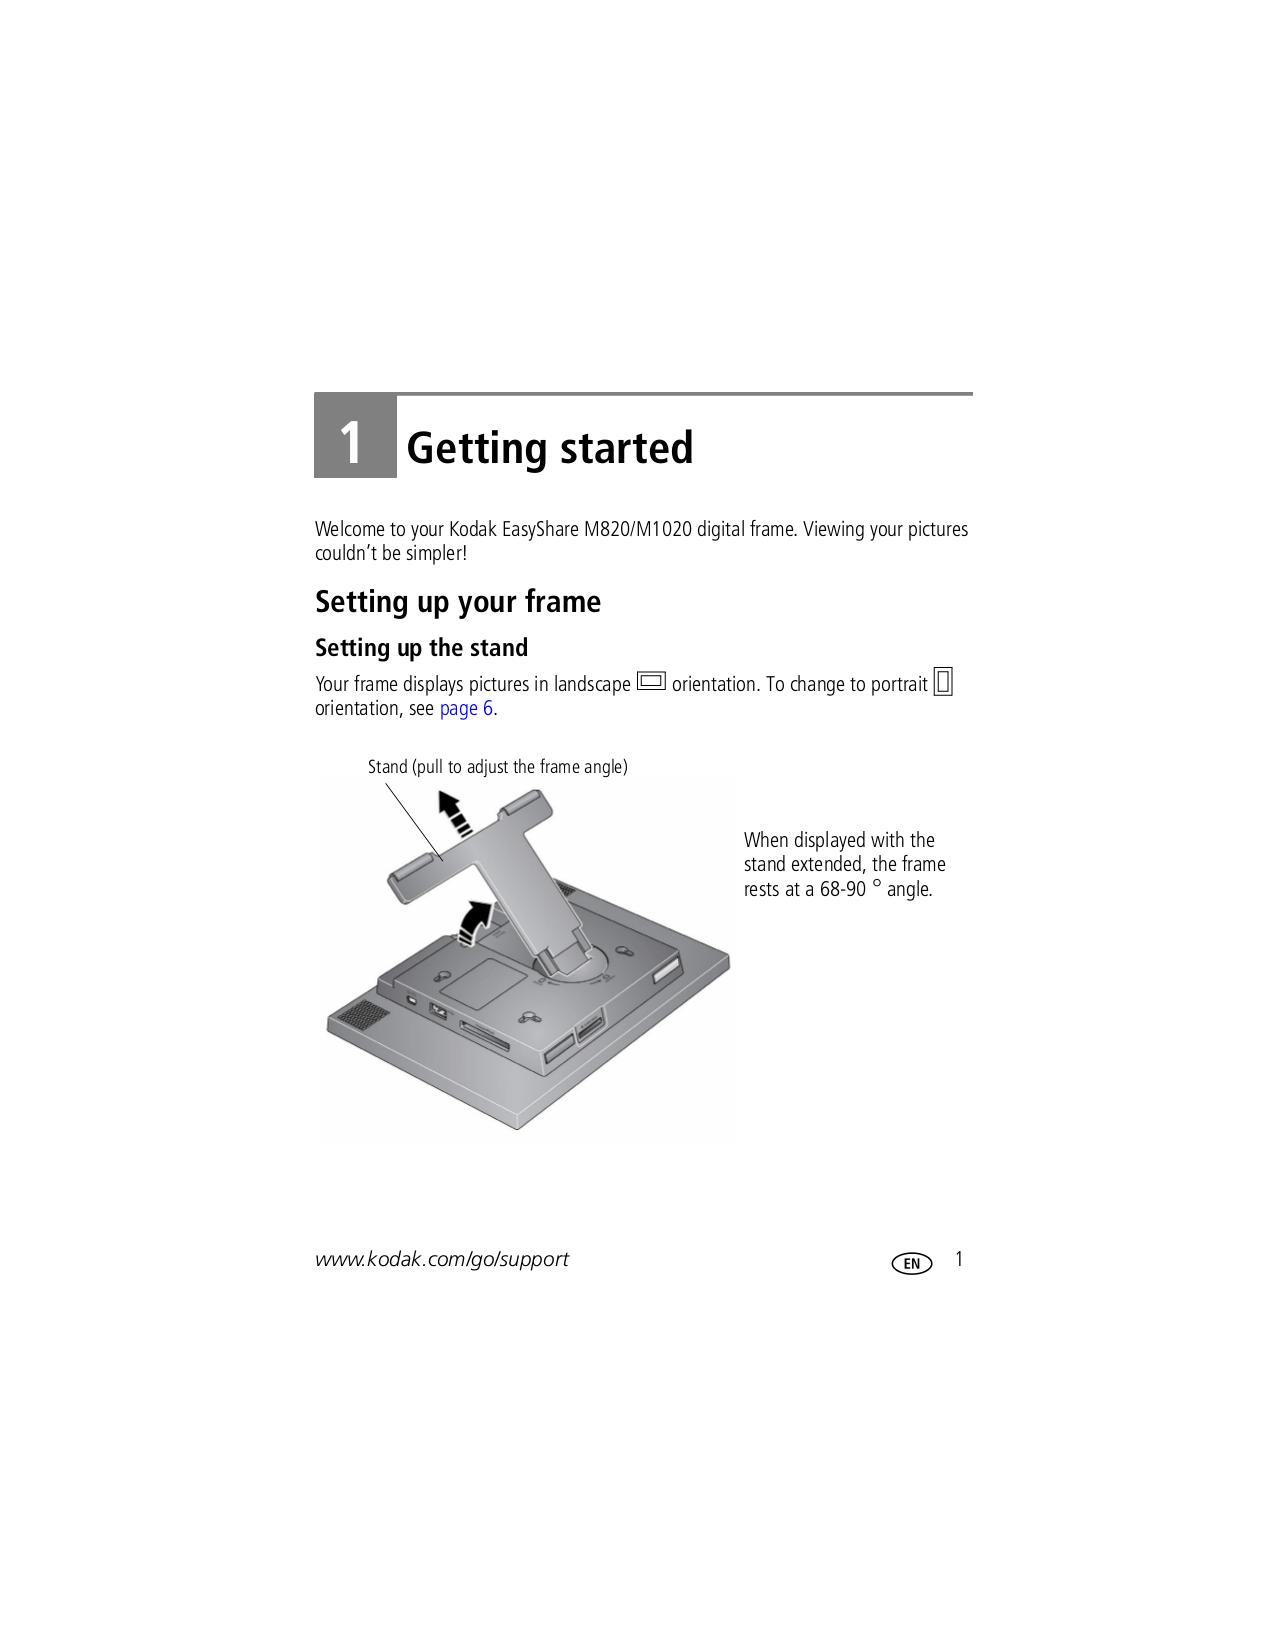 PDF manual for Kodak Digital Photo Frame EasyShare M820